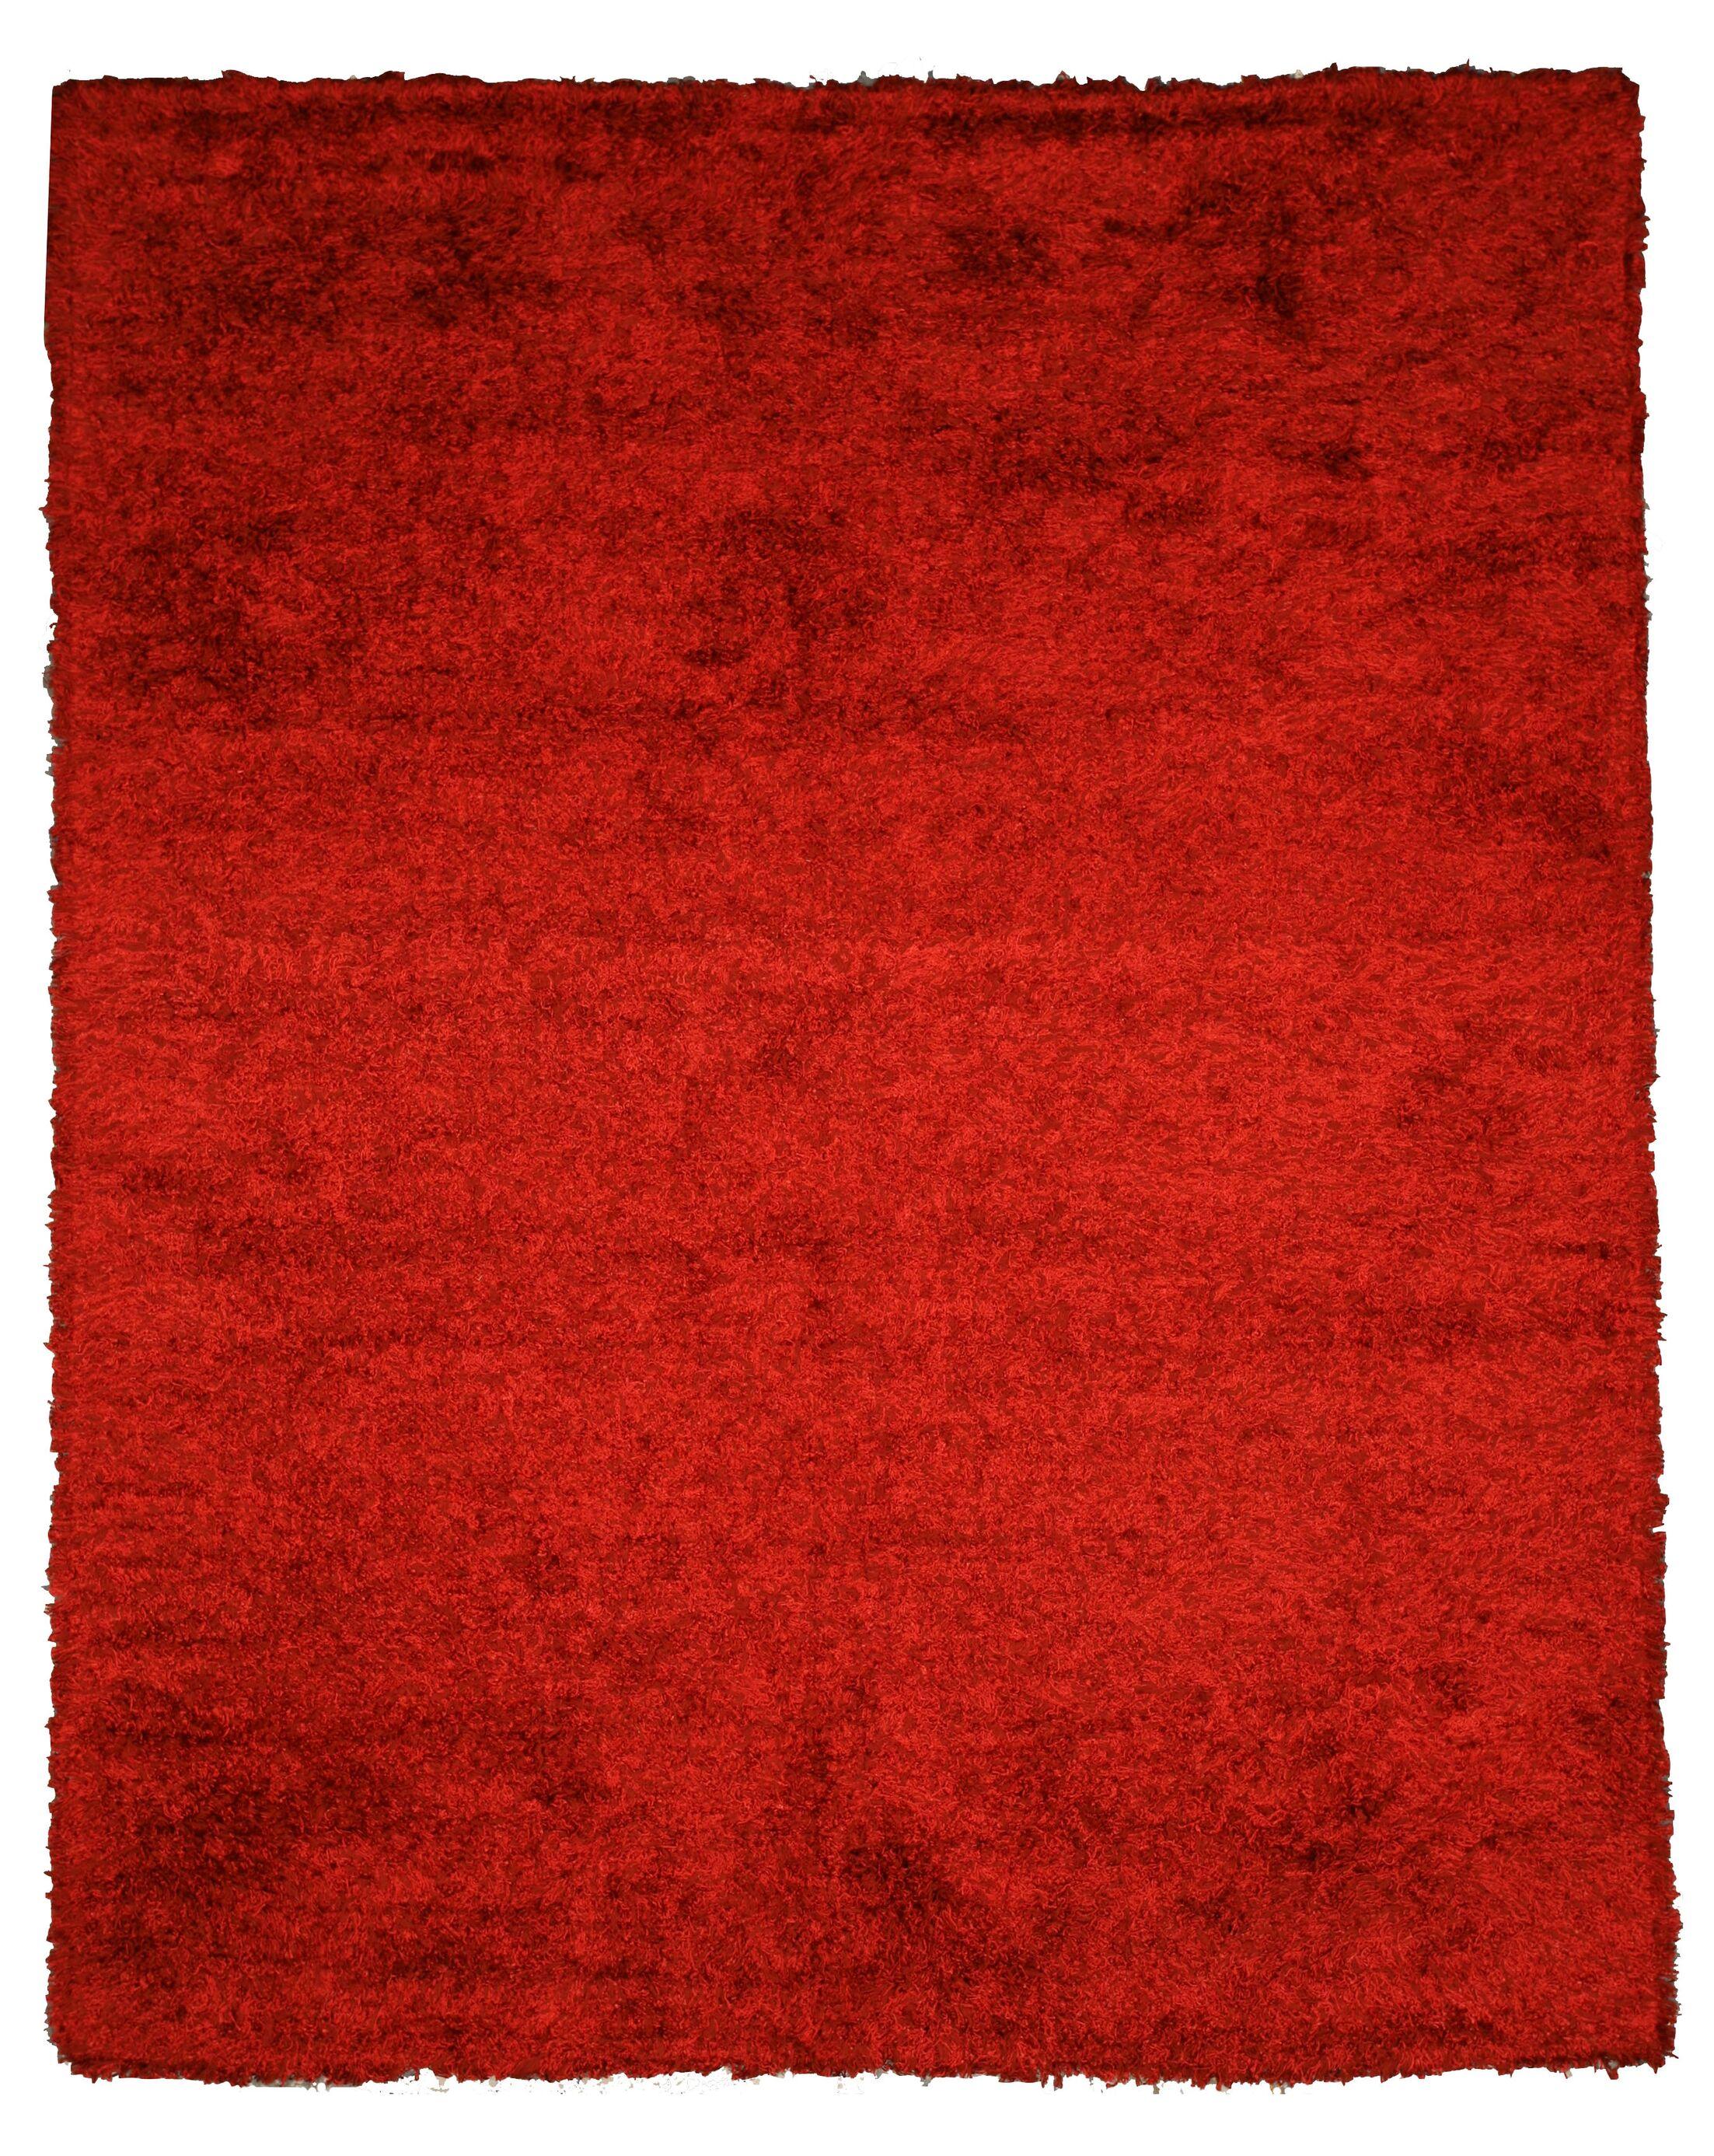 Jalandhar Hand-Woven Red Area Rug Rug Size: Rectangle 8' x 10'